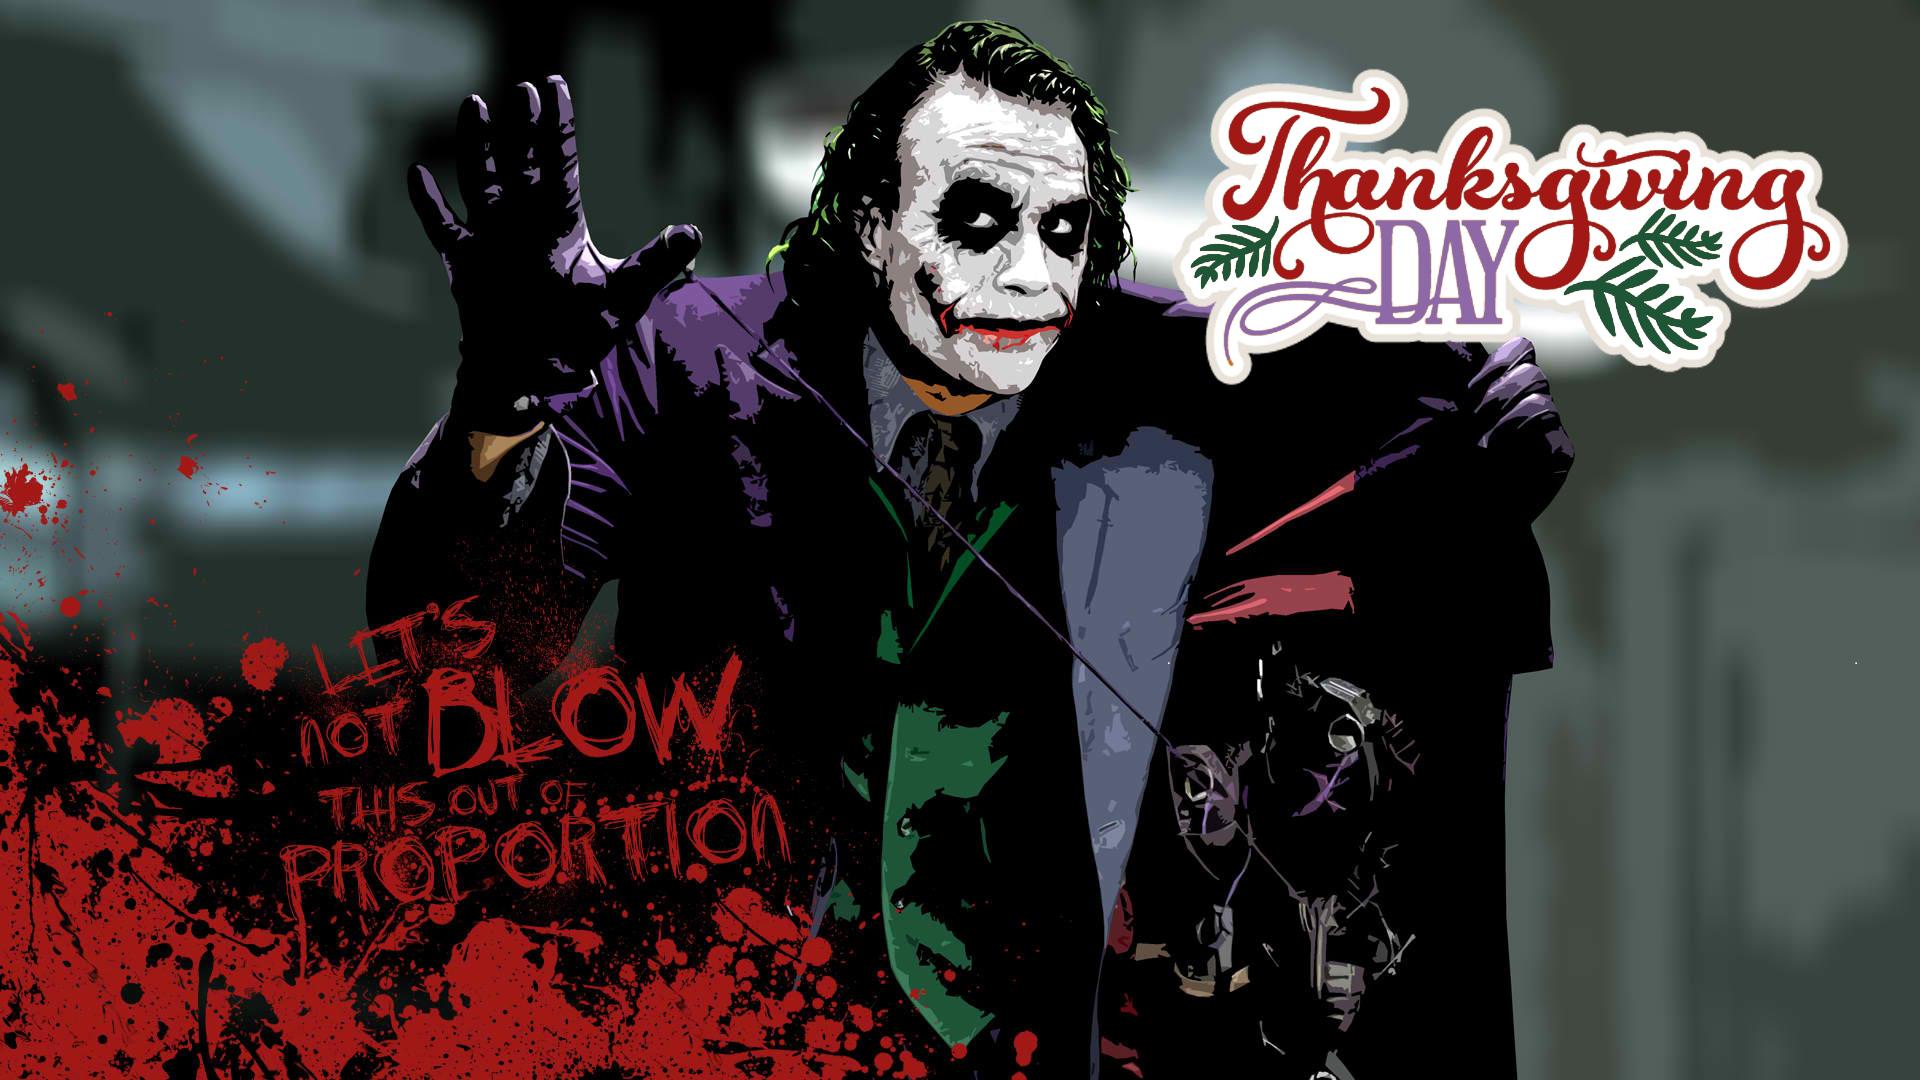 Batman Joker Wishing Happy Thanksgiving Day Hd Background Wallpaper